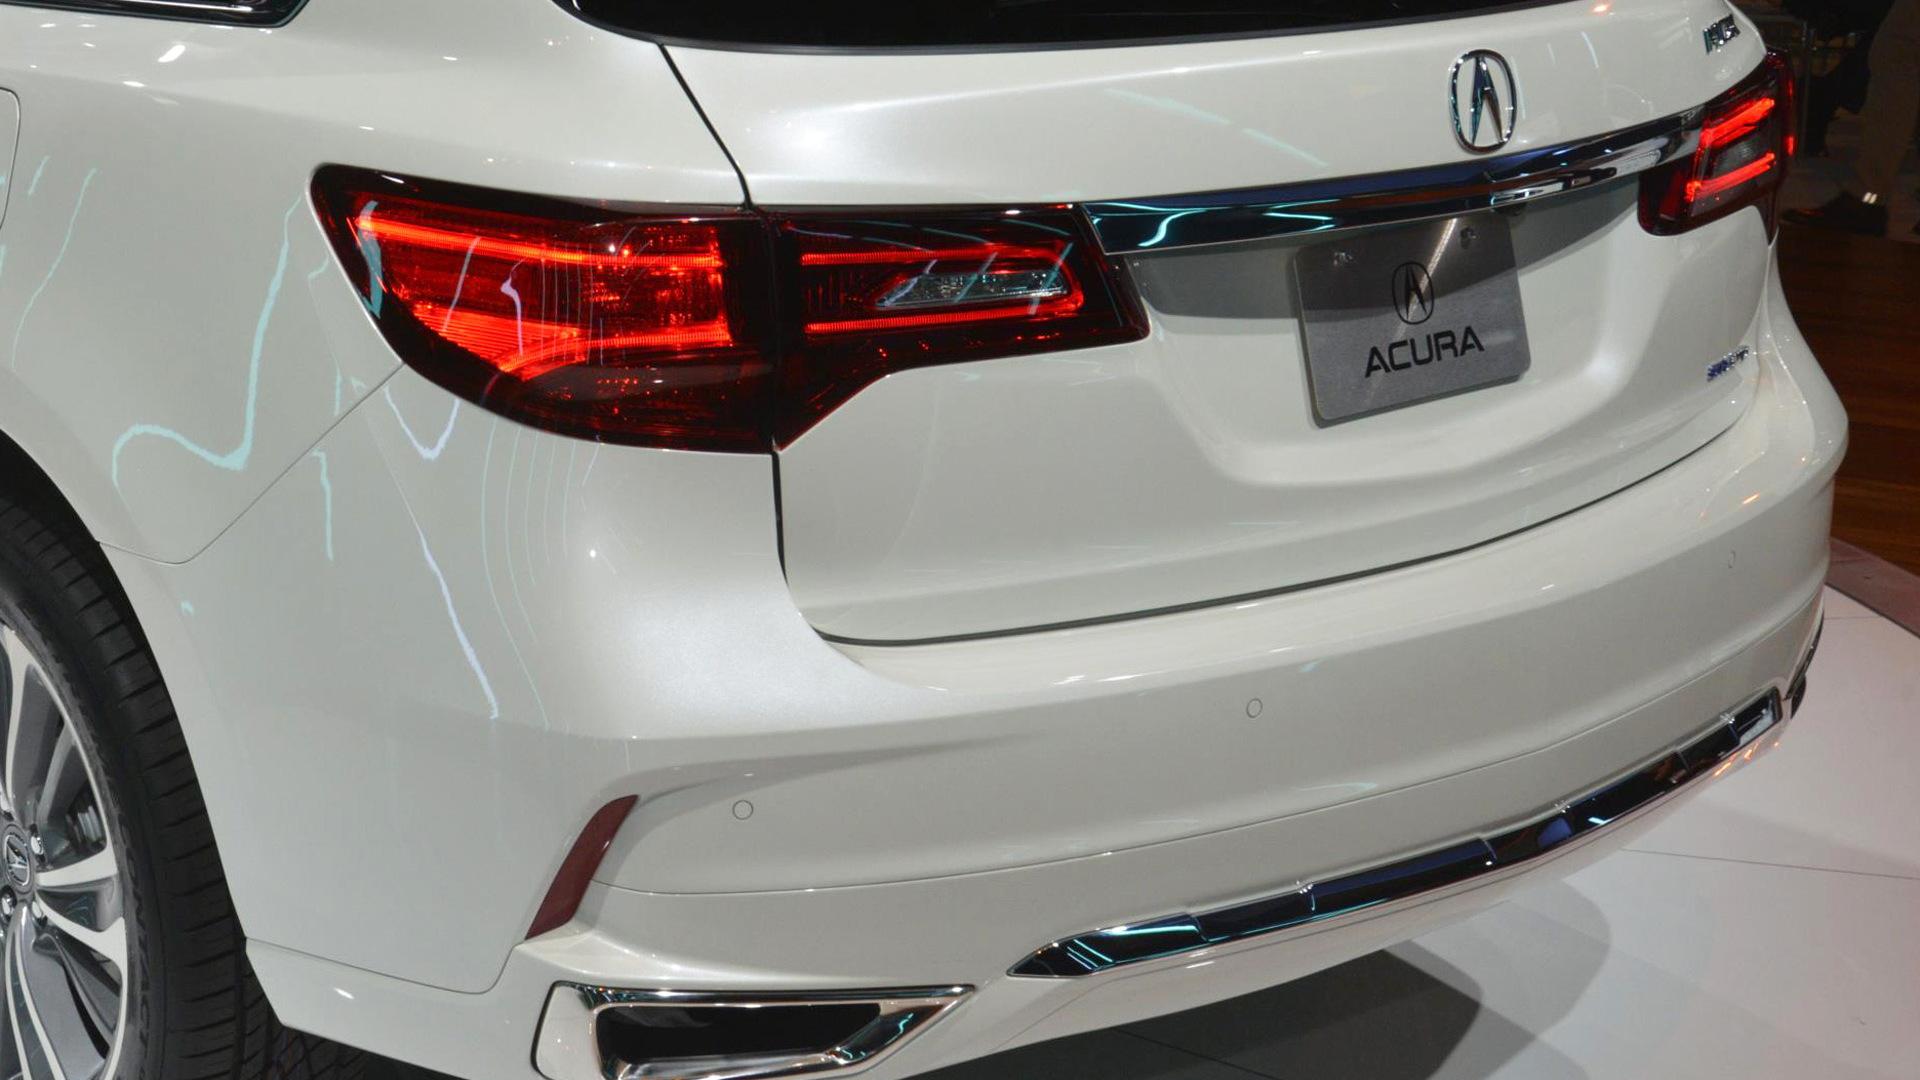 2017 Acura MDX, 2016 New York Auto Show